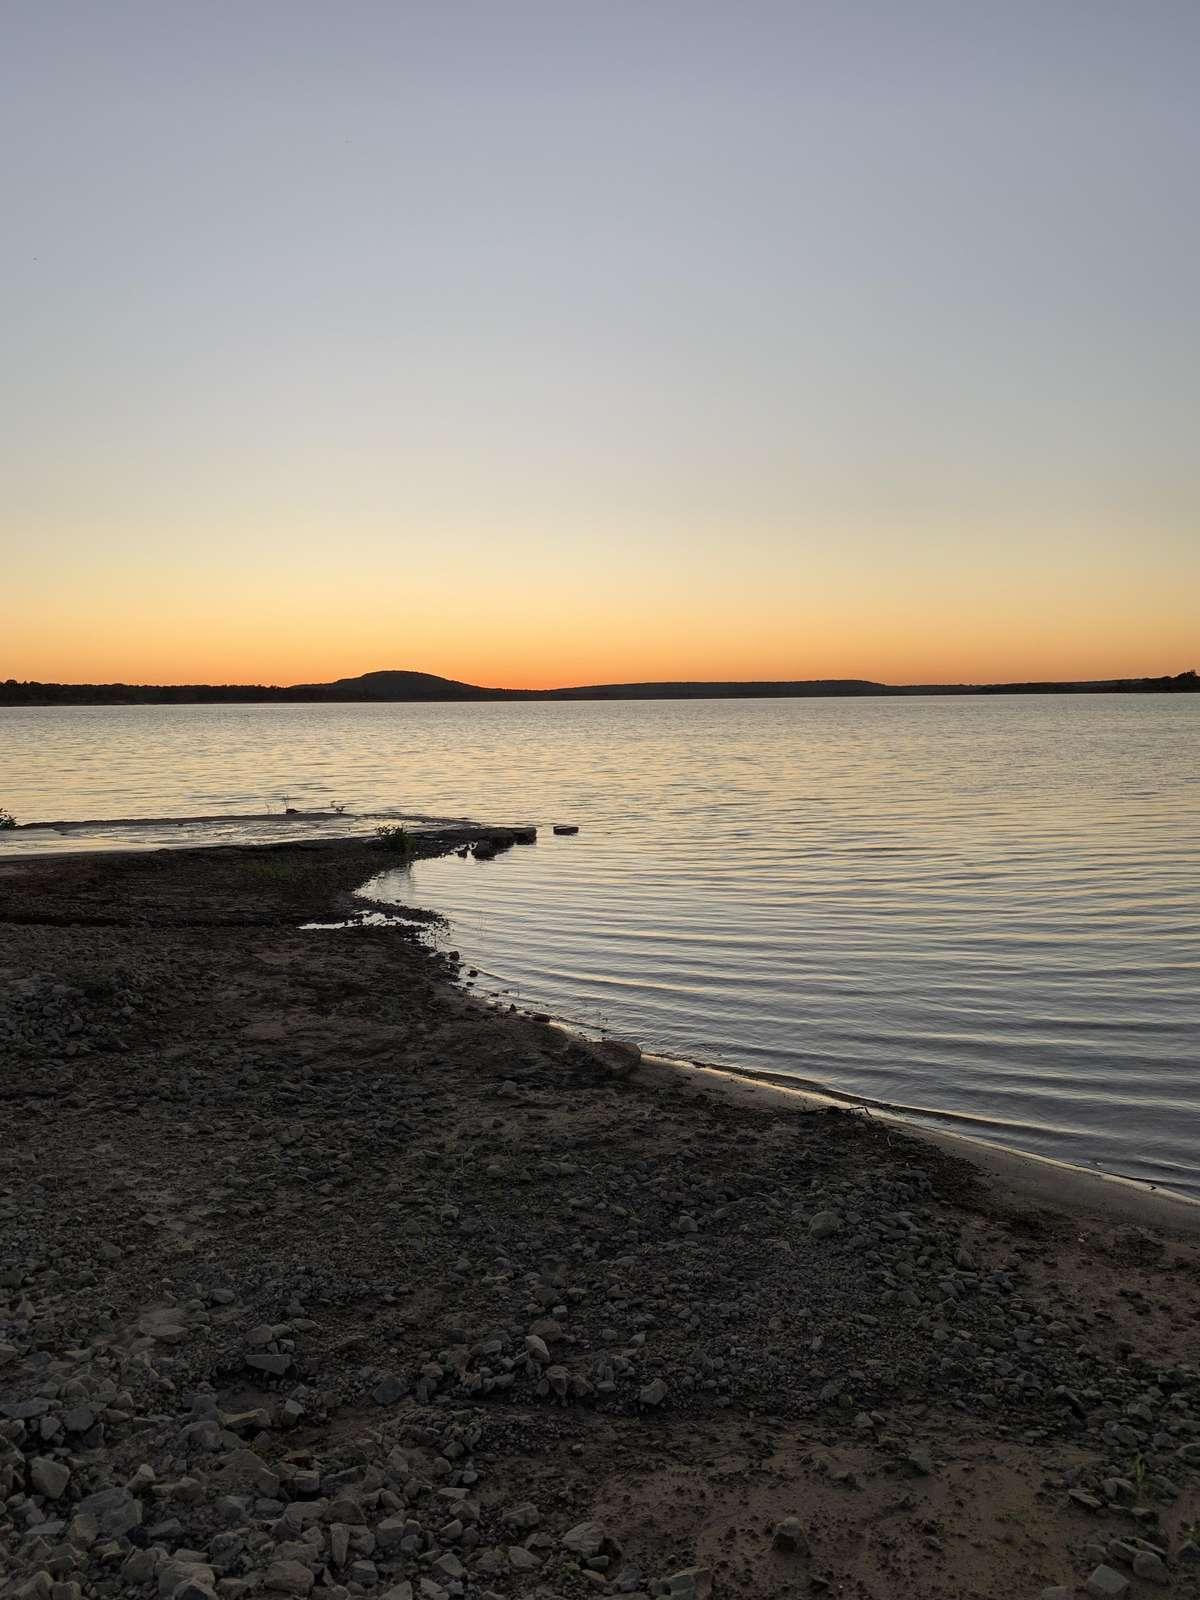 View of Lake Eufaula From Neighborhood Boat Ramp/Beach